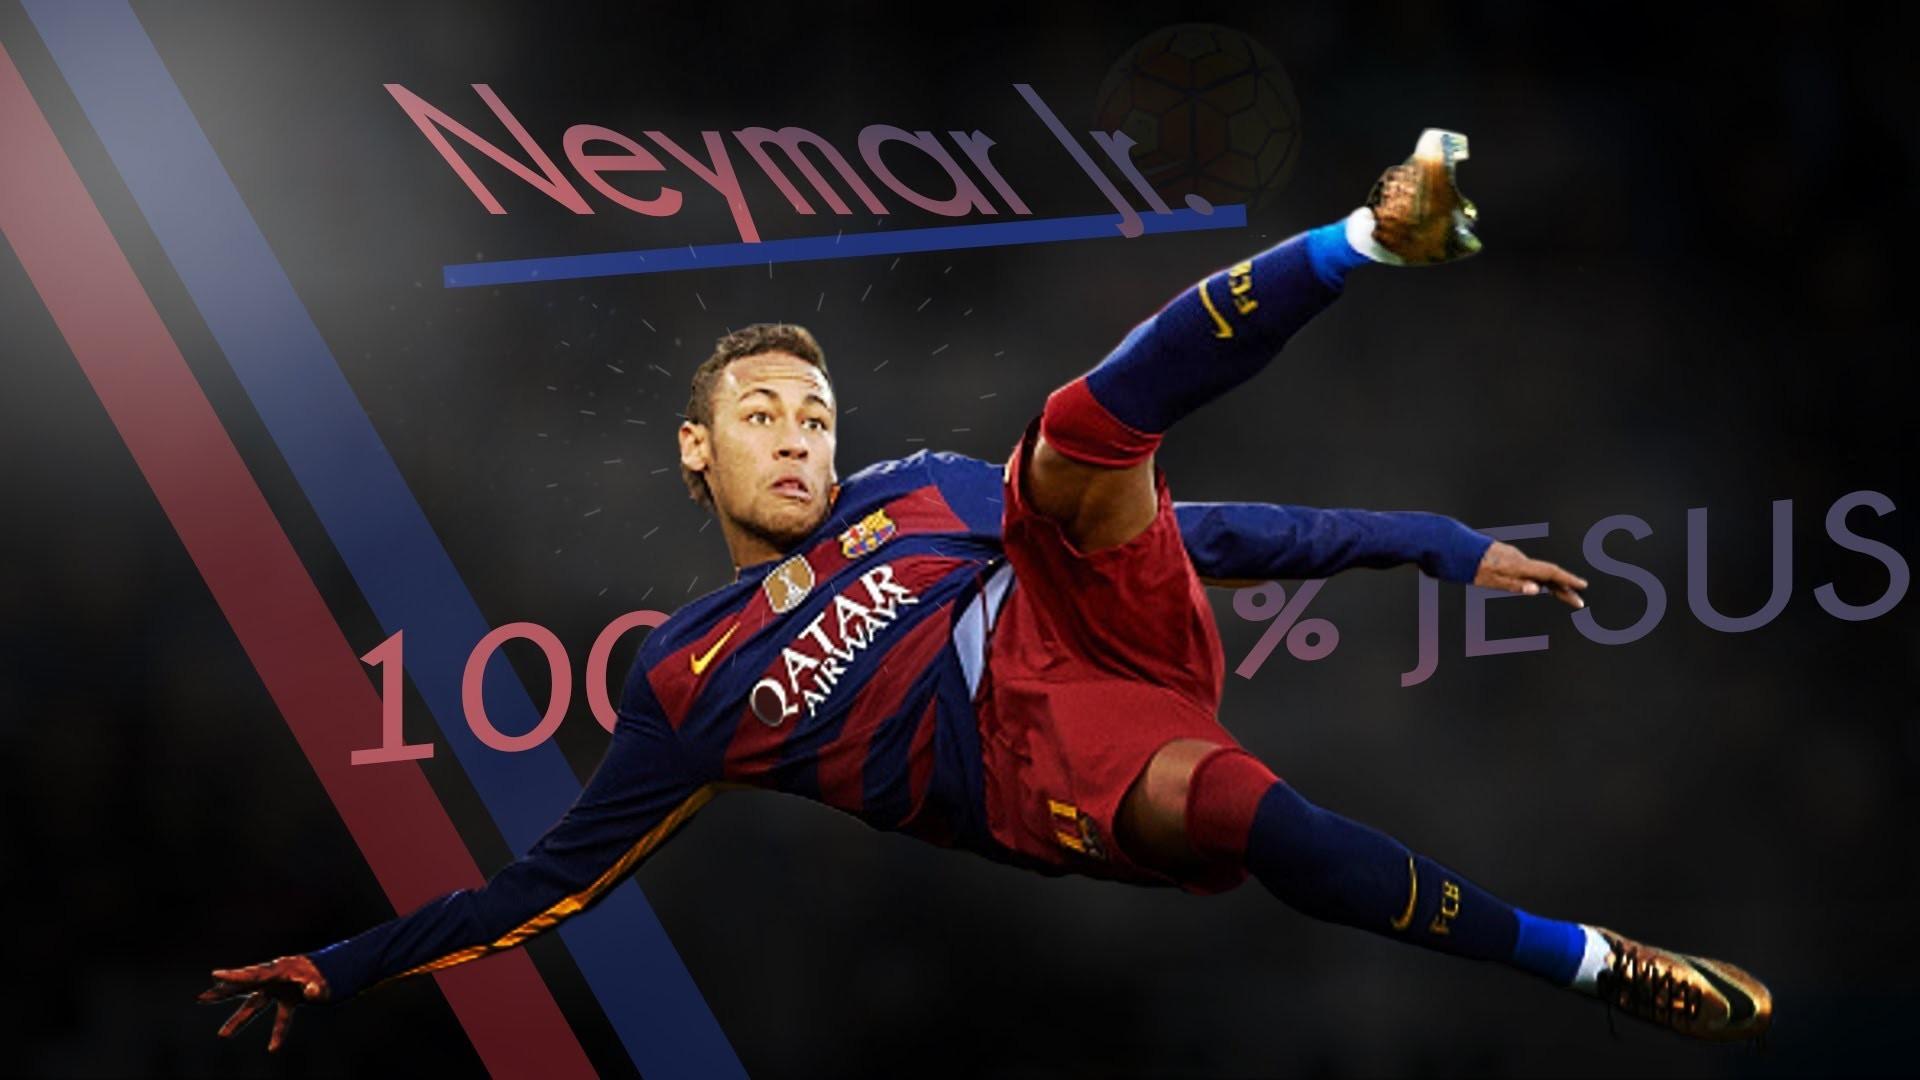 Neymar Brazil Wallpaper 2018 HD ·① WallpaperTag